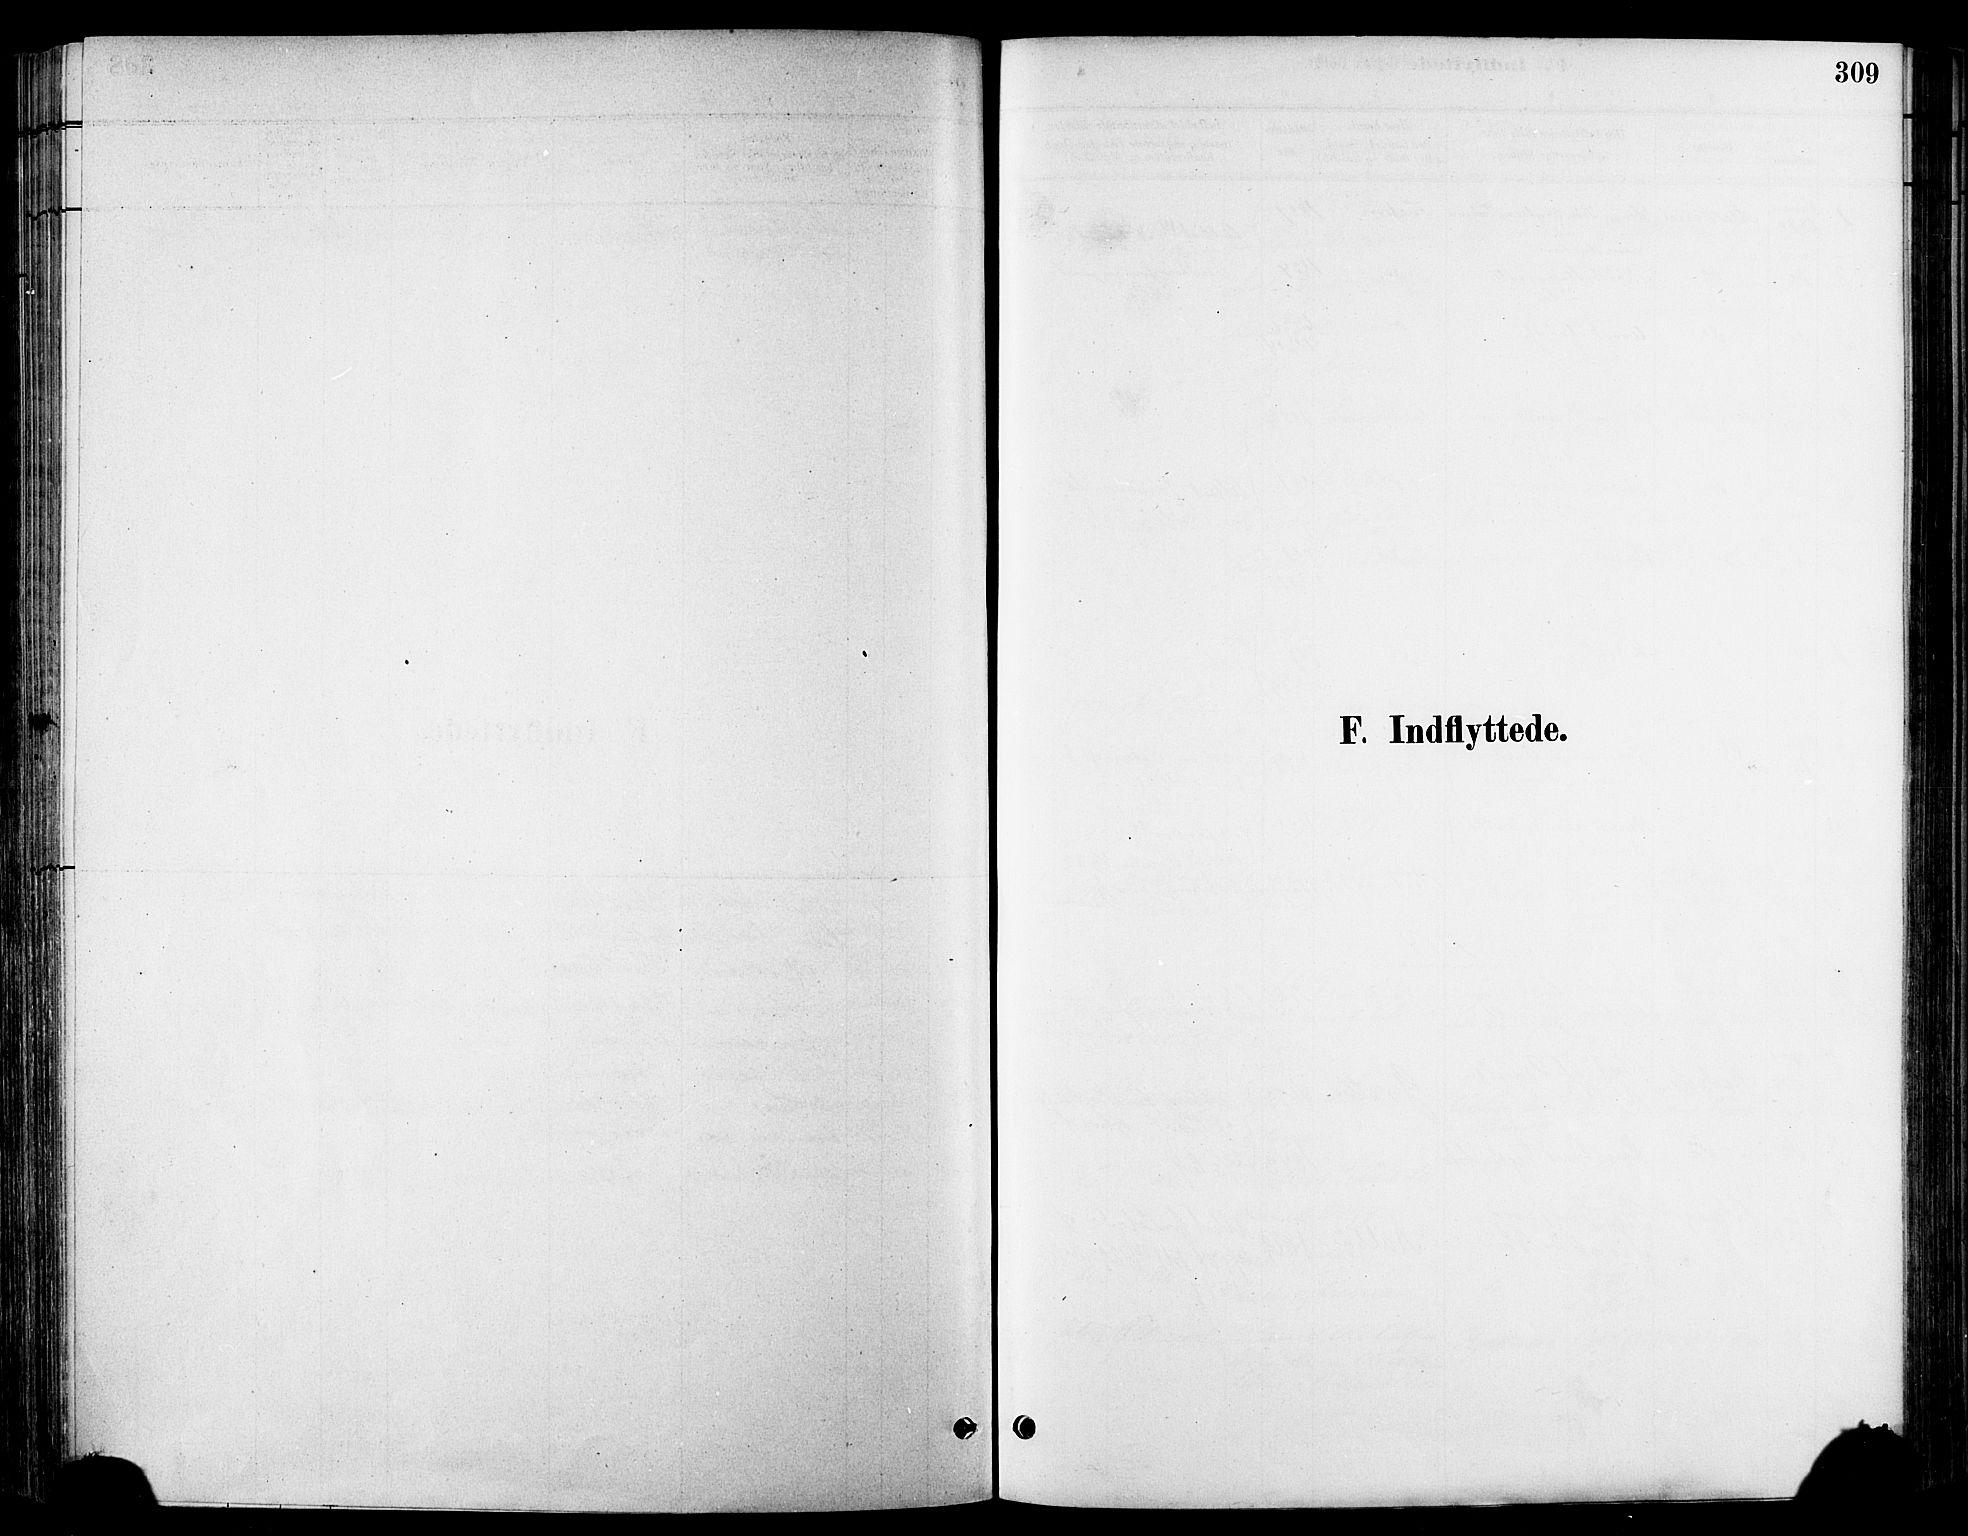 SAT, Ministerialprotokoller, klokkerbøker og fødselsregistre - Sør-Trøndelag, 678/L0901: Parish register (official) no. 678A10, 1881-1894, p. 309